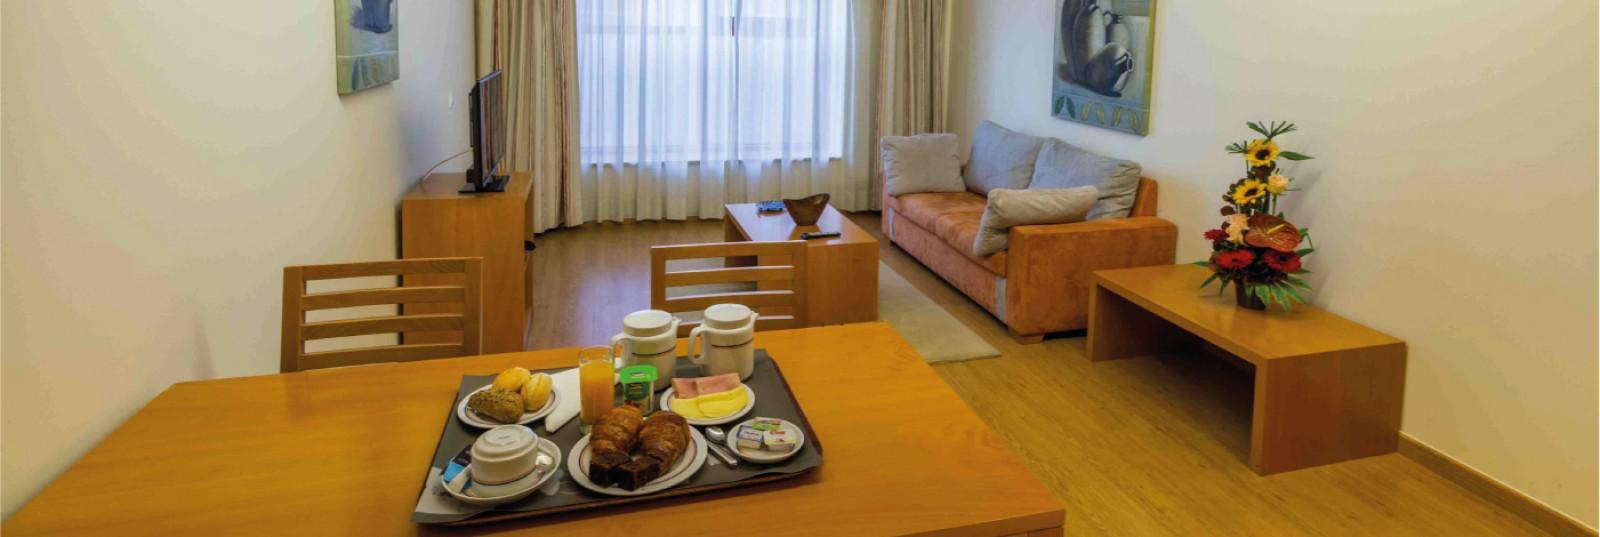 Eurosol Residence Hotel Apartamento - T1